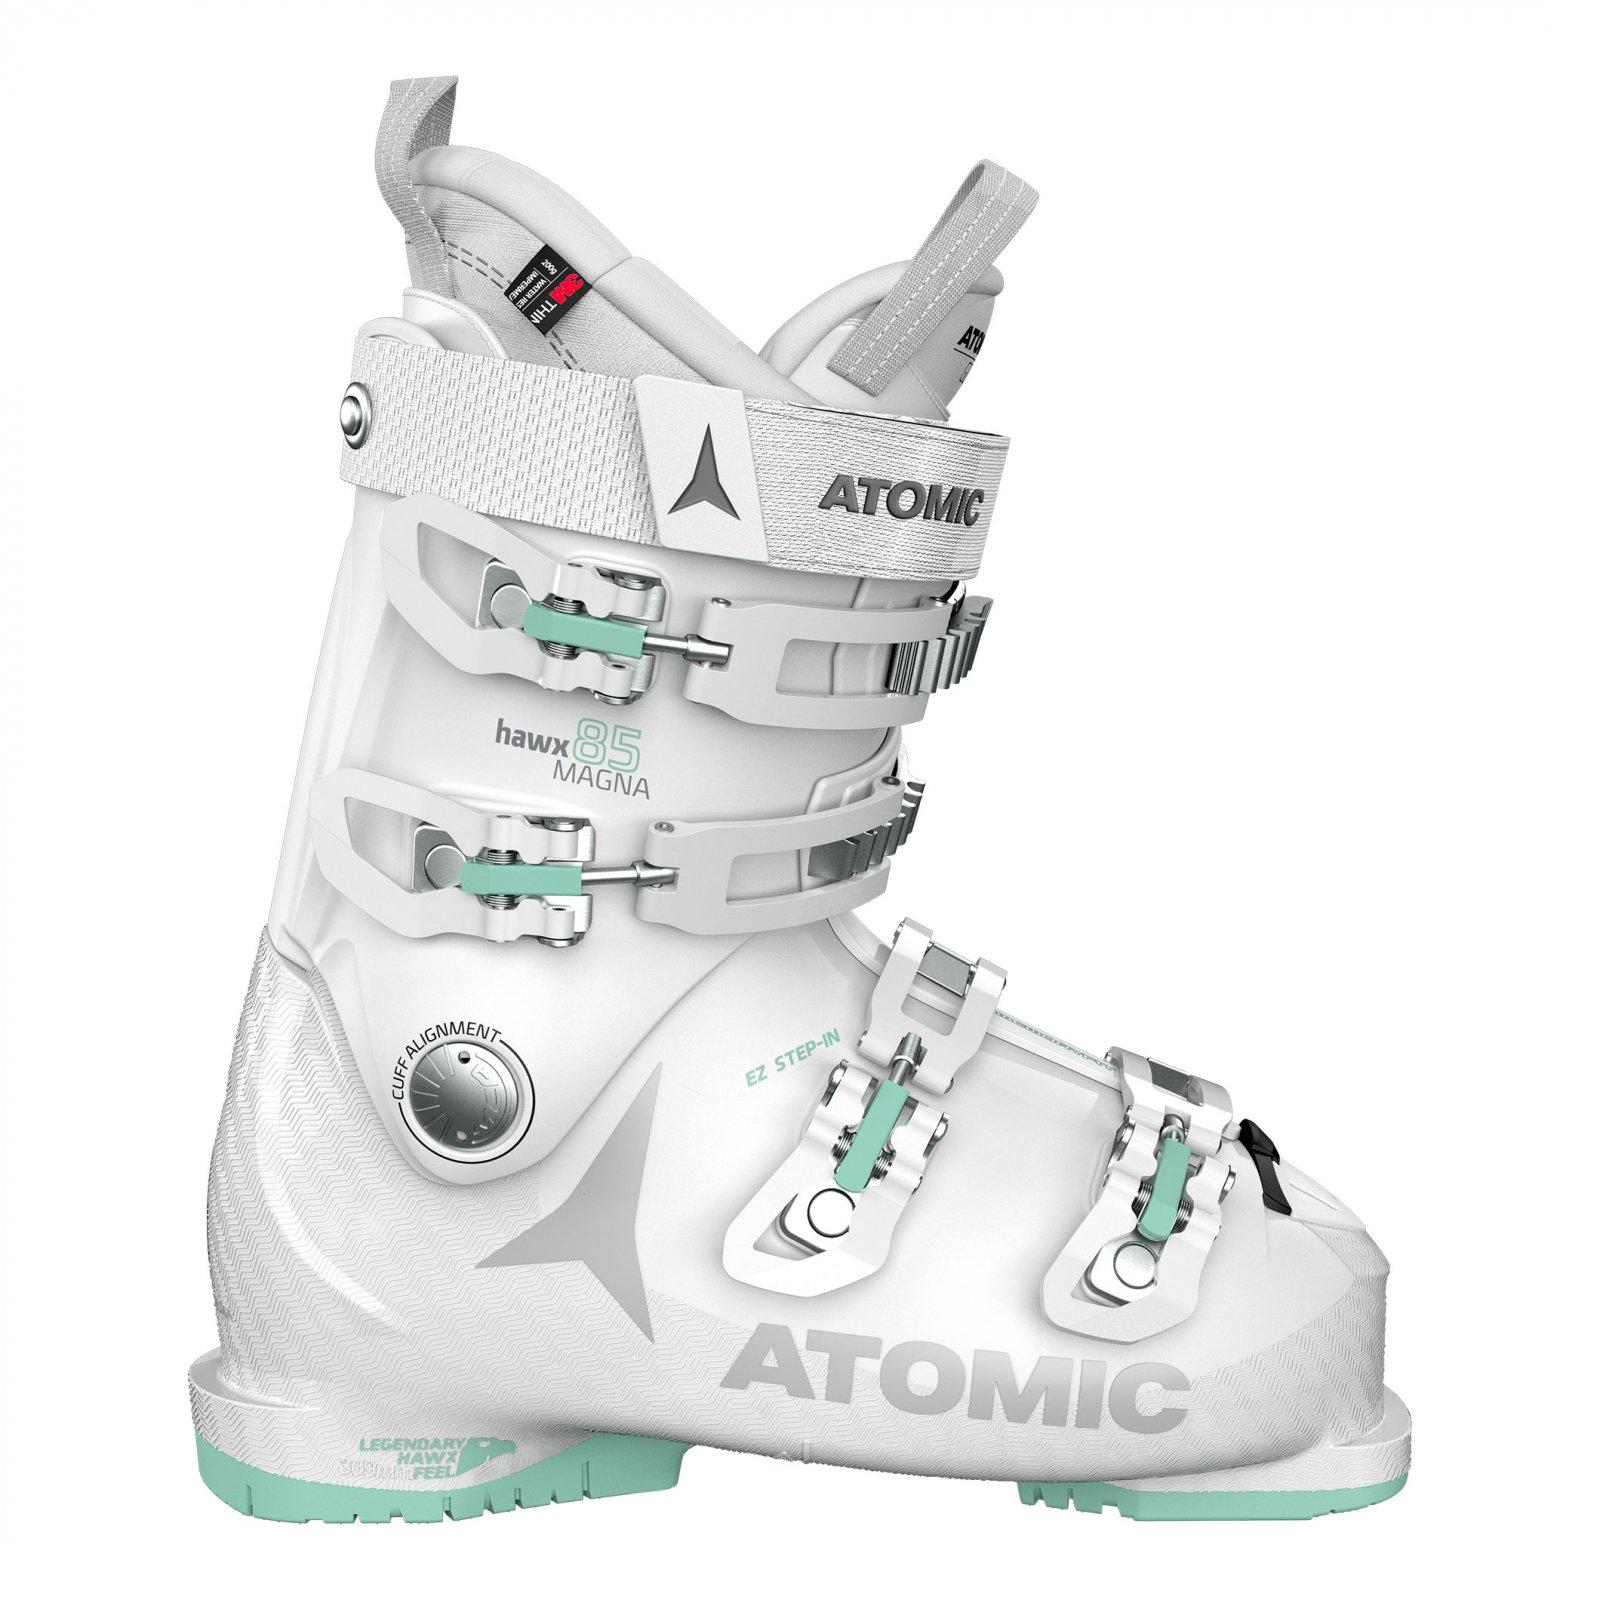 2021 Atomic Hawx Magna 85 Women's Ski Boots